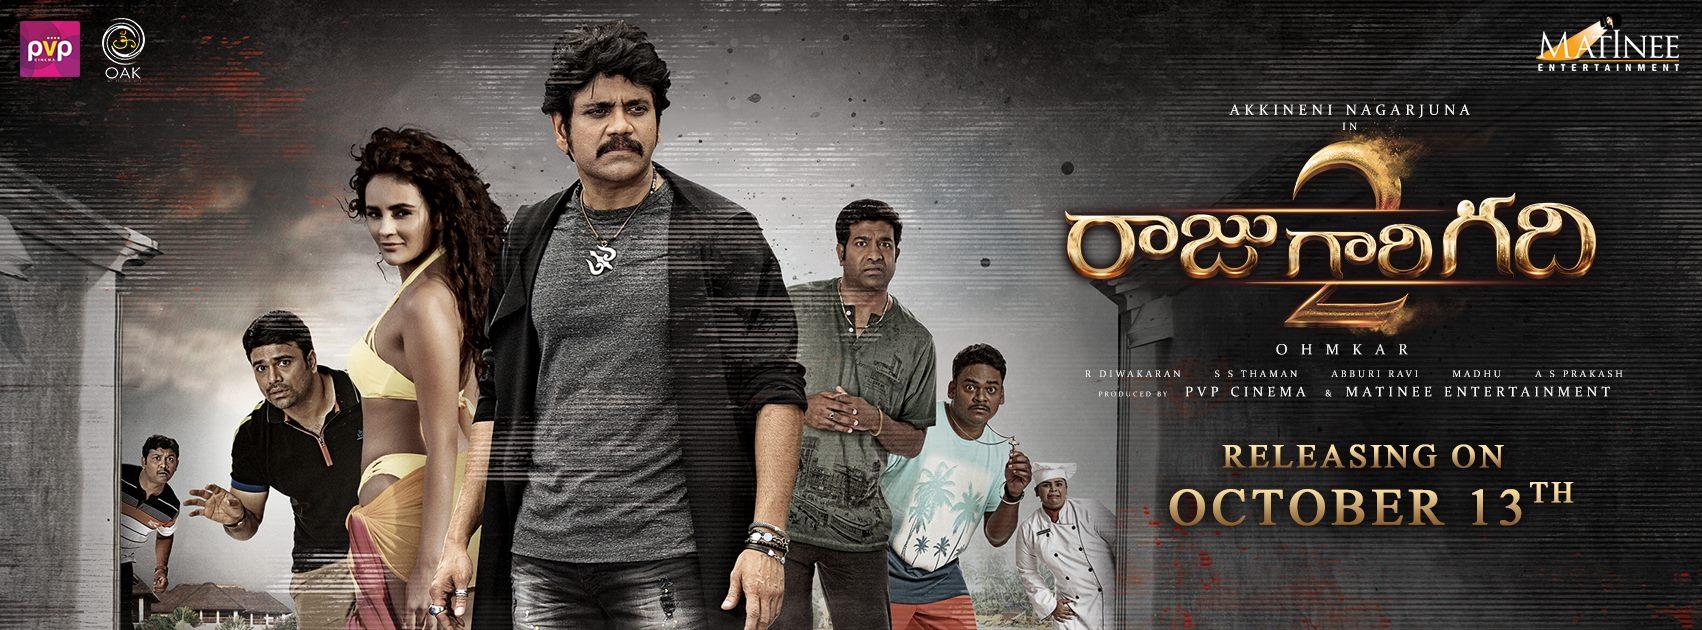 nagarjuna raju gari gadhi 2 movie first look ultra hd